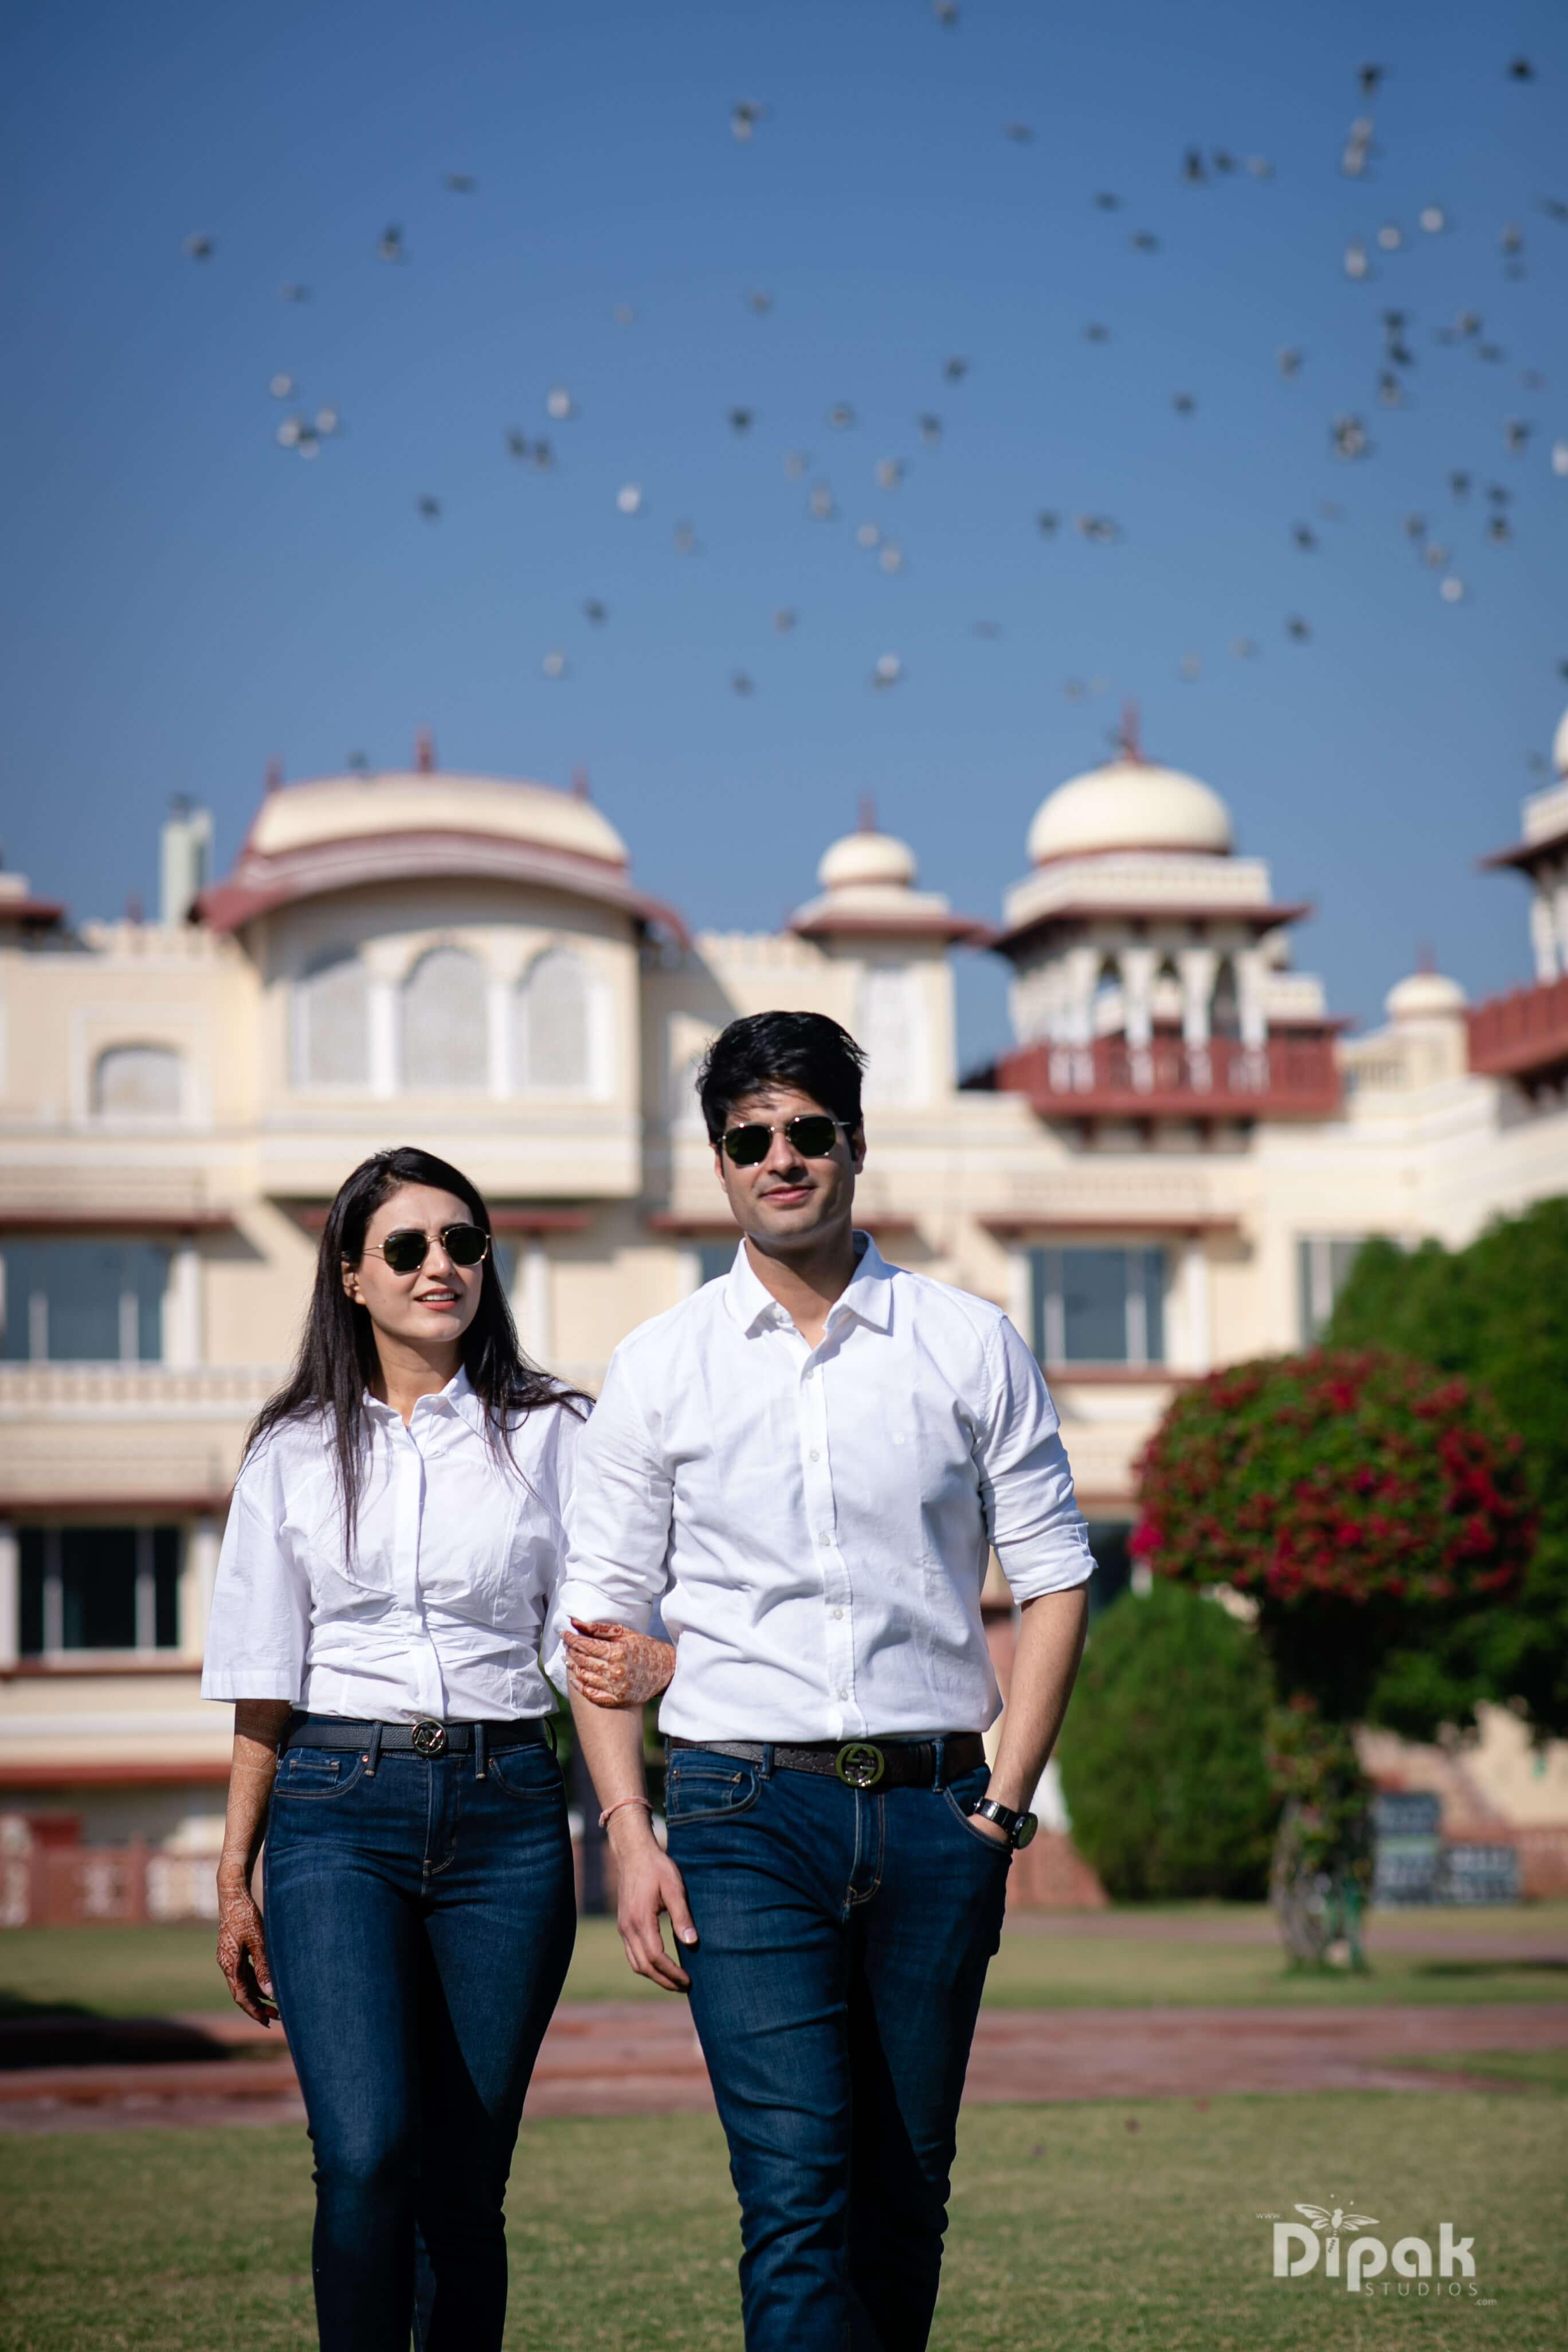 pre wedding shoot ideas, Wedding At Jai Mahal Palace